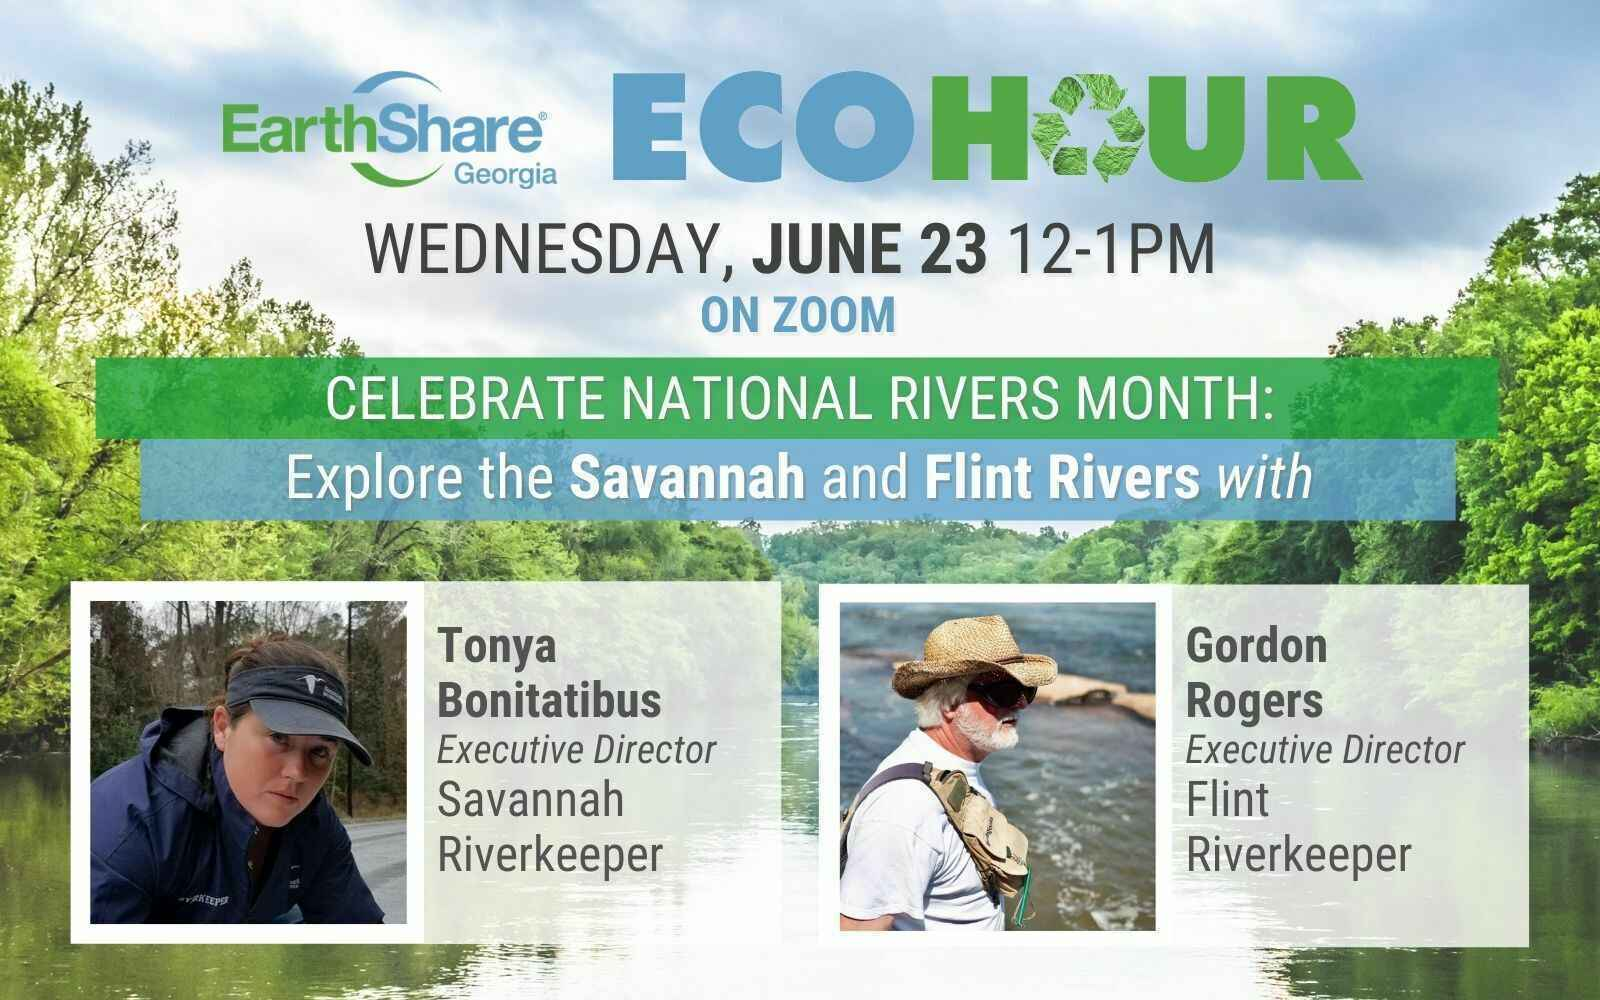 EcoHour: EarthShare Georgia Celebrates National Rivers Month – Explore the Flint and Savannah Rivers!  image